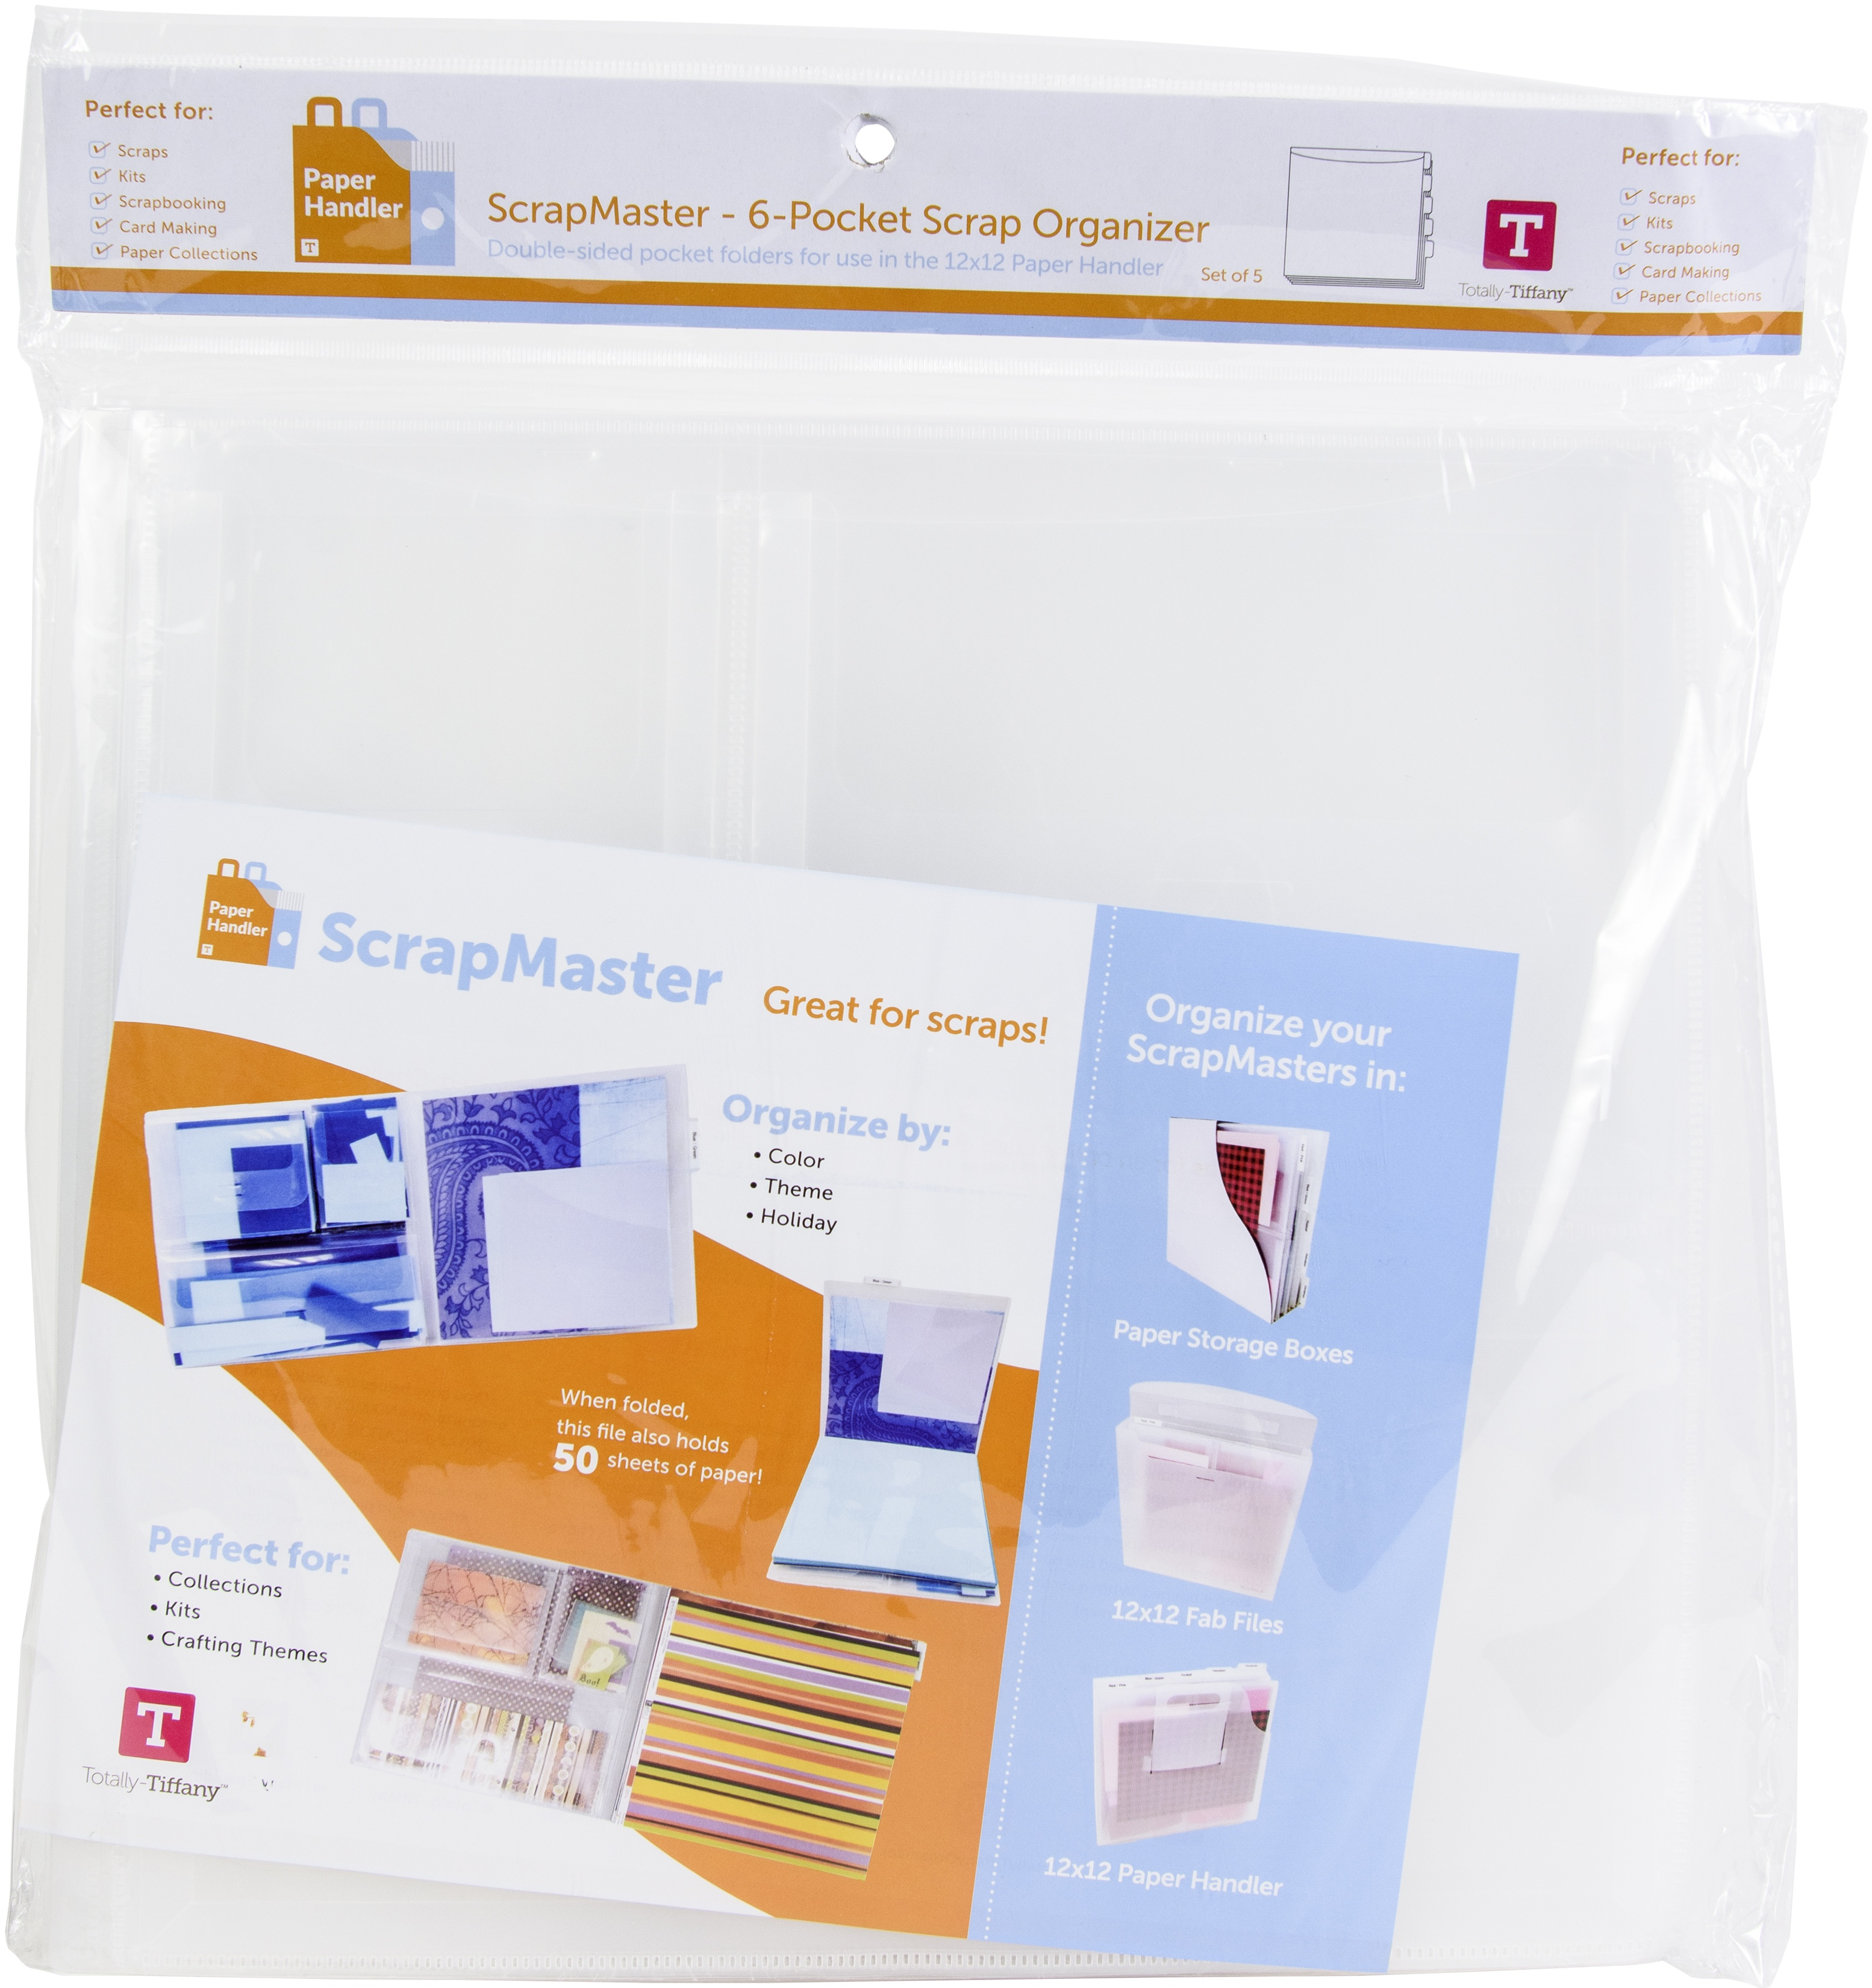 ScrapMaster Scrap Paper Organizer 5/Pkg - Totally Tiffany